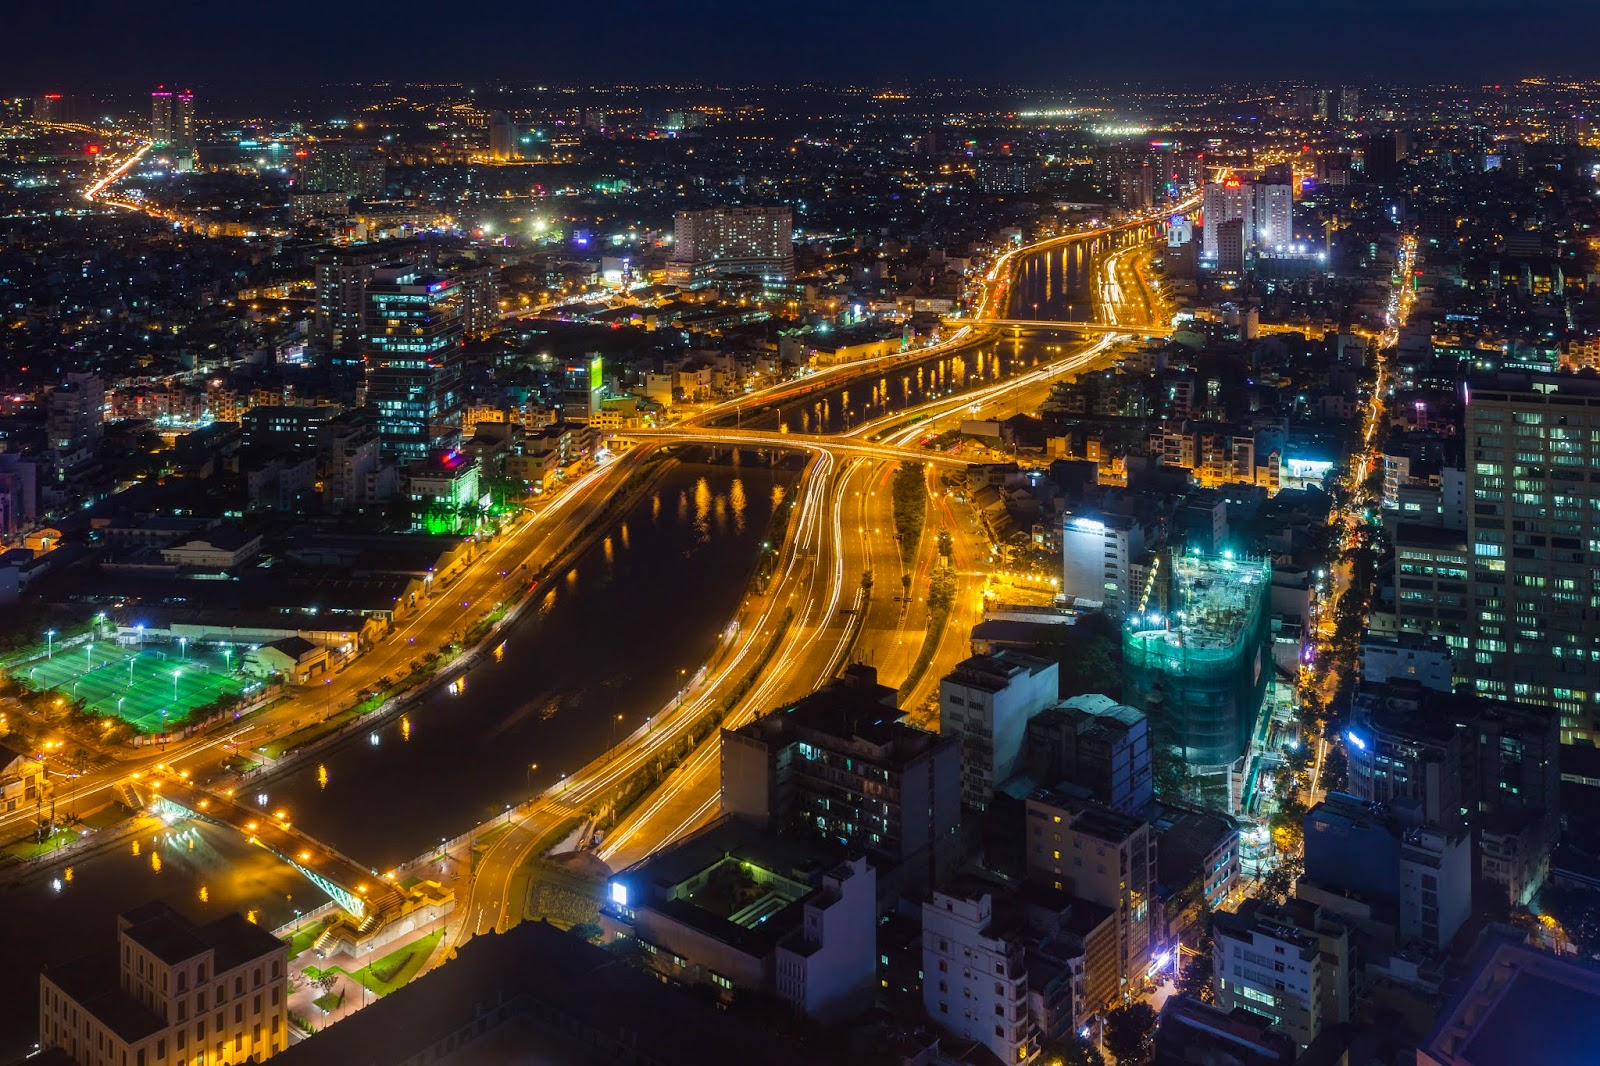 ho chi minh city is Ho chi minh city: ho chi minh city, largest city in vietnam.